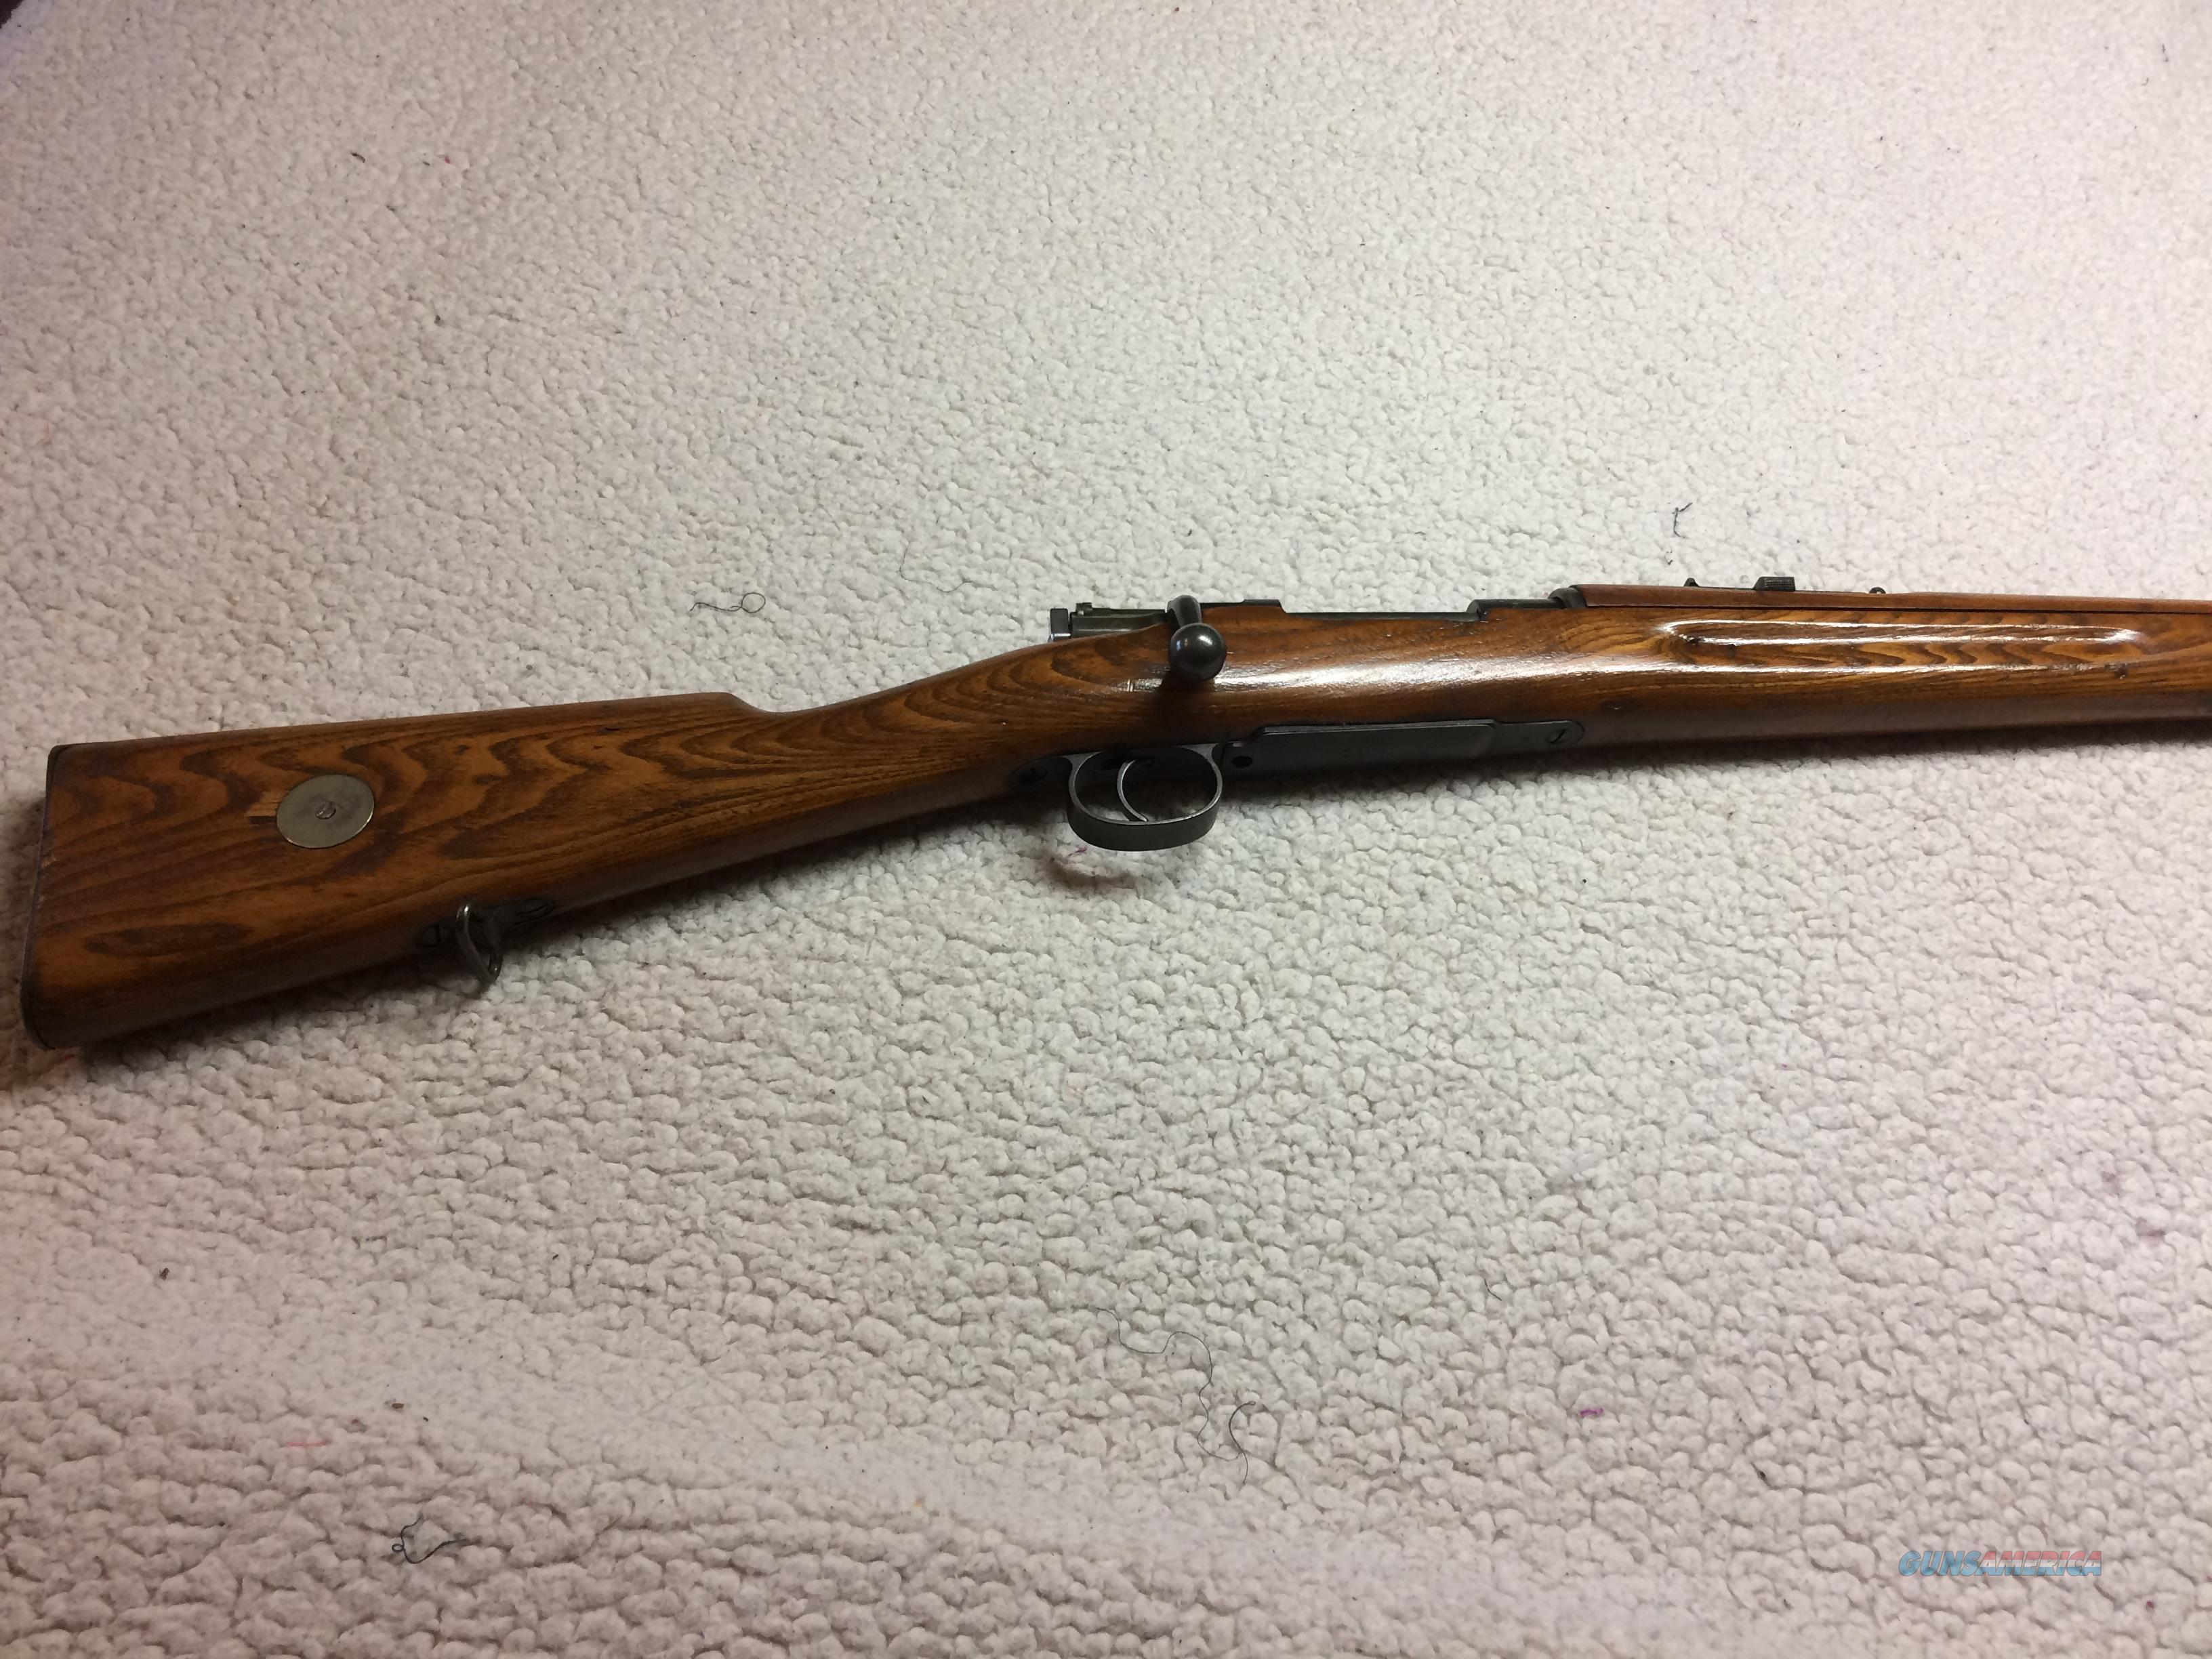 SWEEDISH MAUSER  Guns > Rifles > Mauser Rifles > German